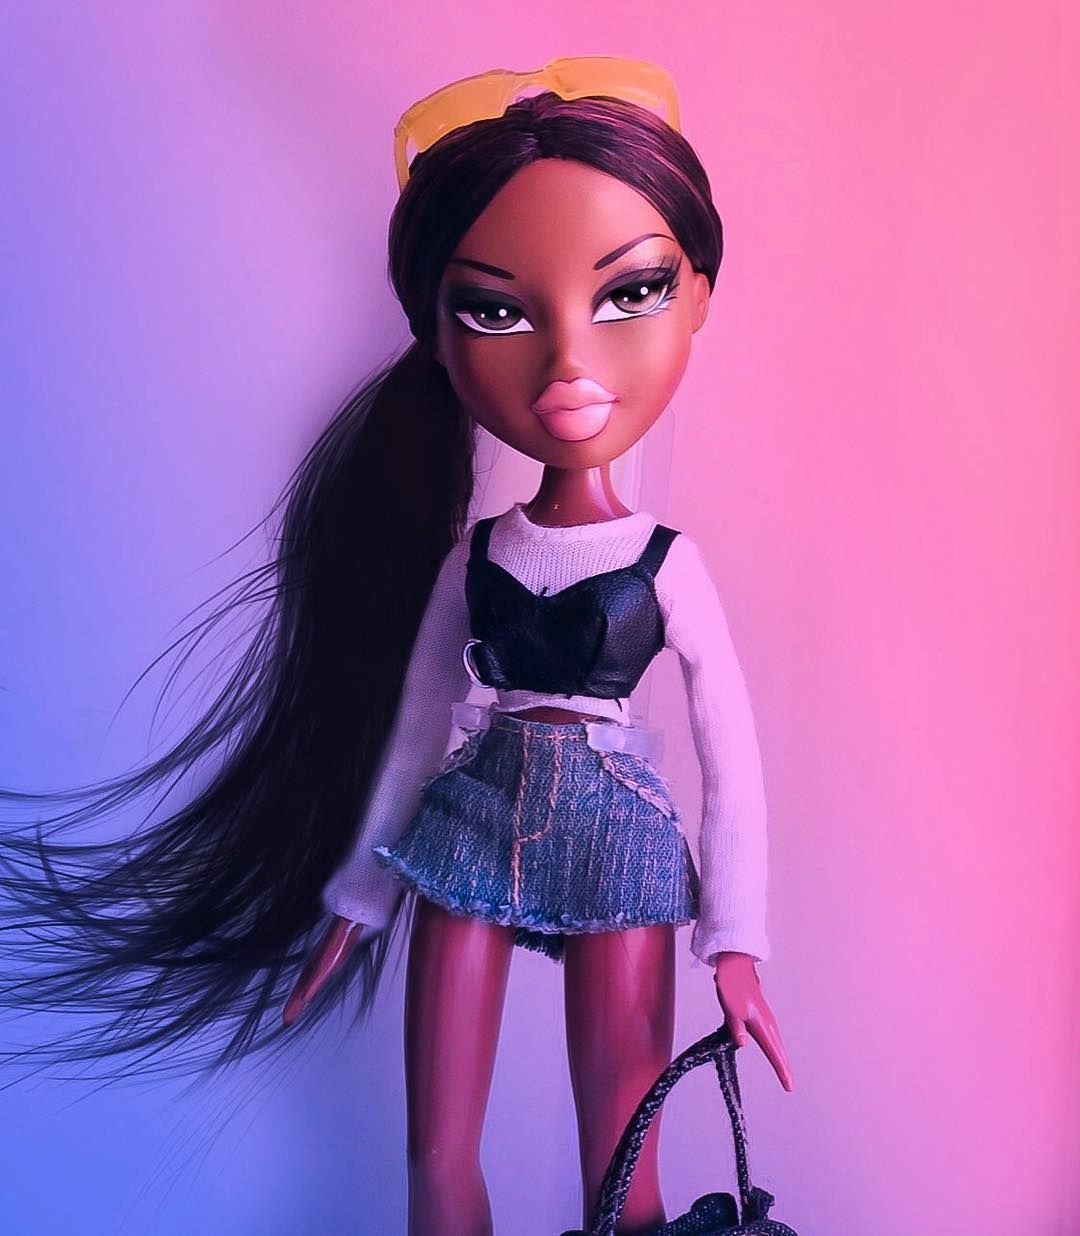 Sasha Bratz Sasha Pink Blue Designer Beauty Makeup Girl Doll Dolls Bratzsasha Style Haydenwilliams Black Bratz Doll Bratz Doll Makeup Doll Halloween Costume